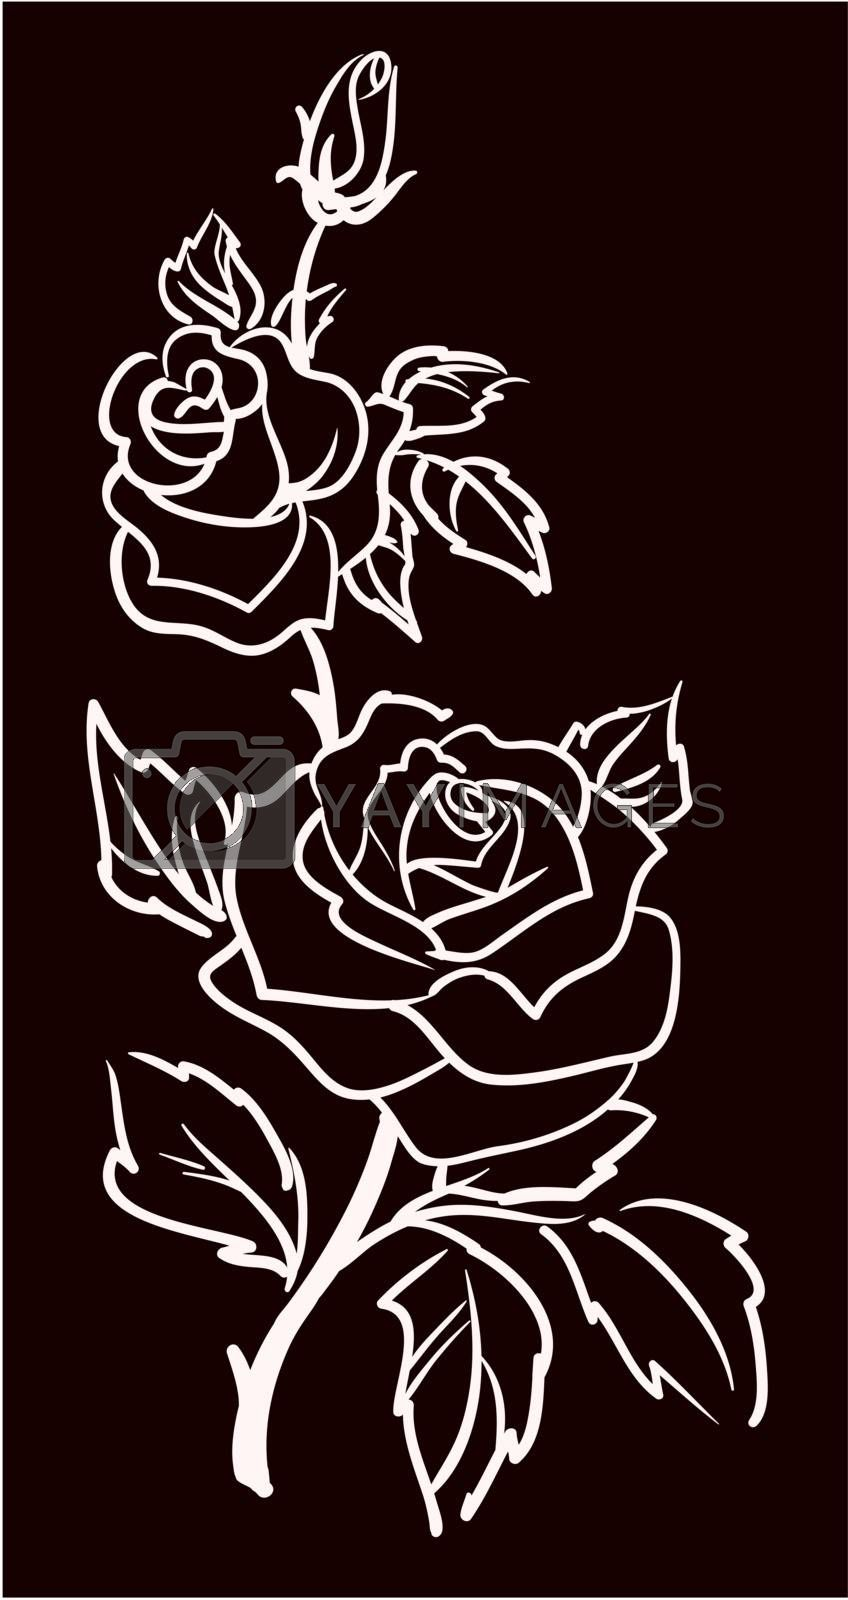 three white roses  isolated on black  background, vector illustration